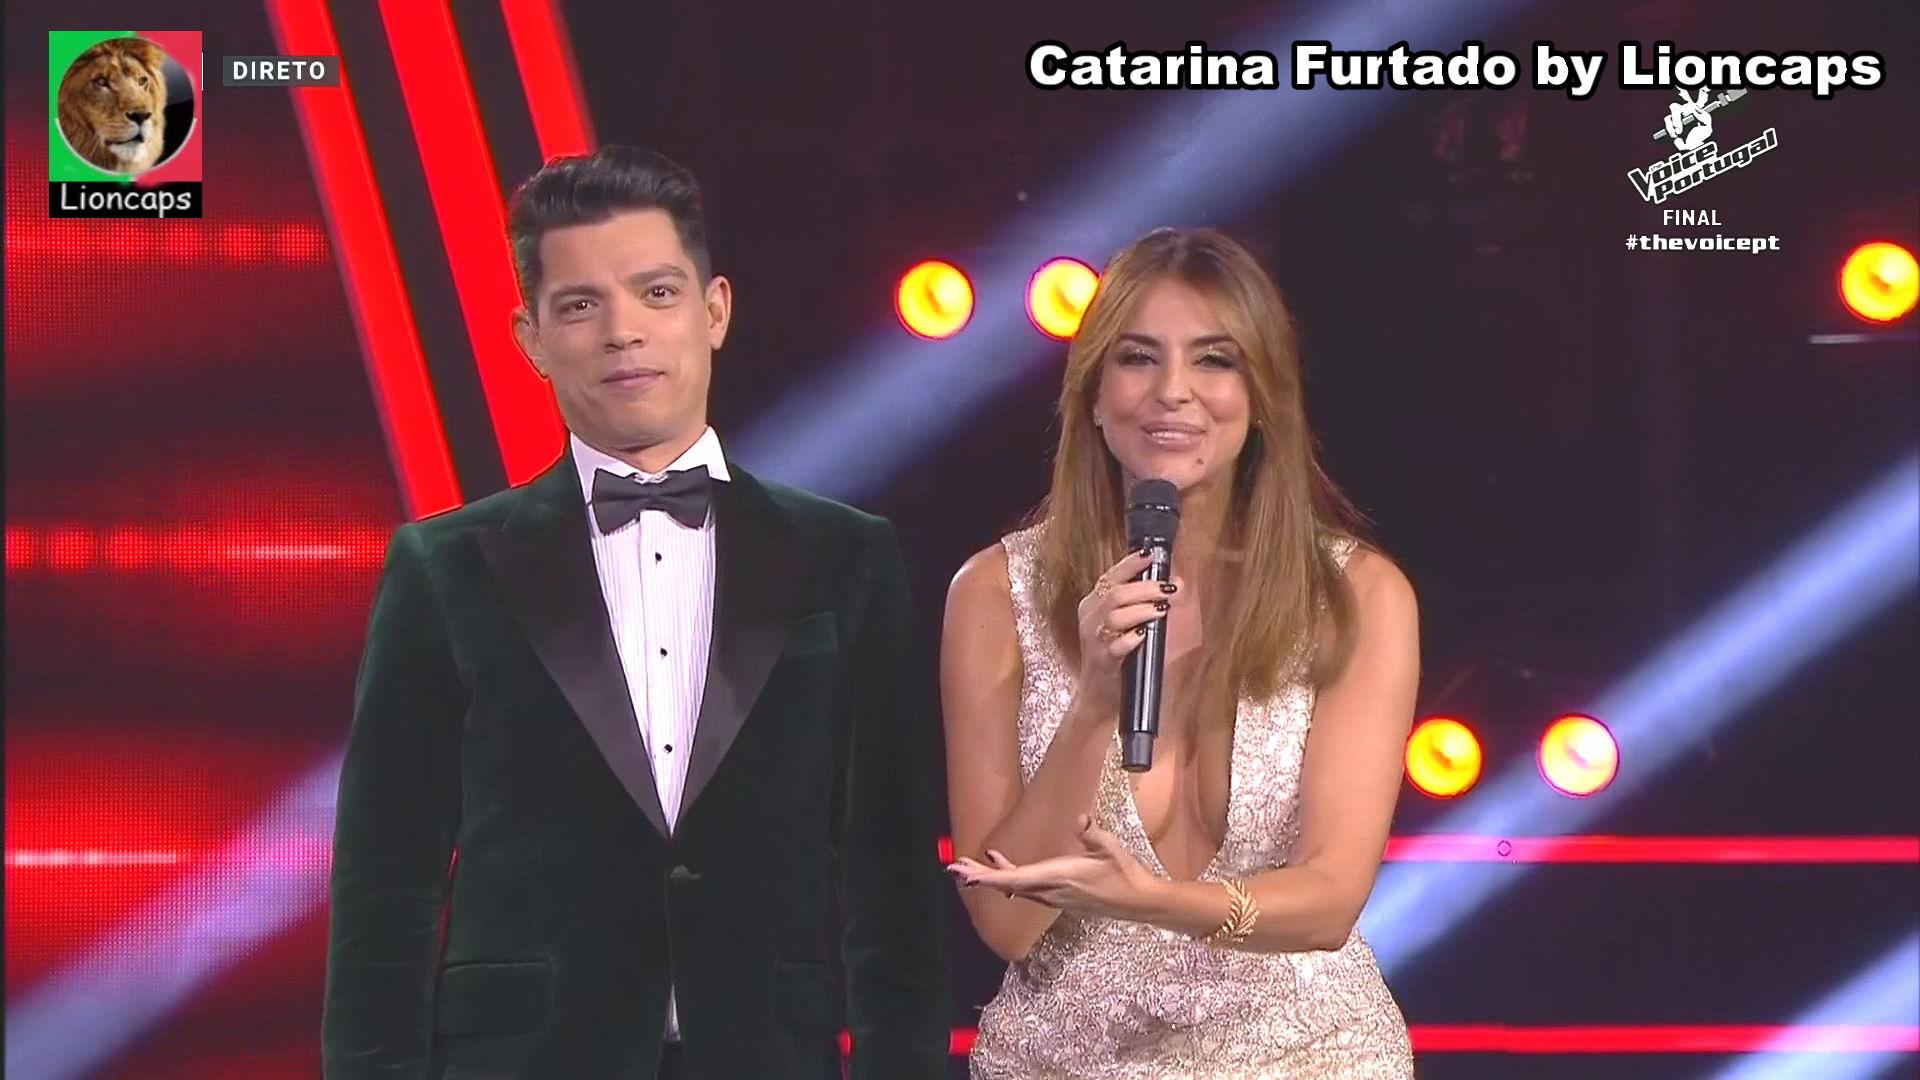 632056617_catarina_furtado_vs200122_0017_122_158lo.JPG